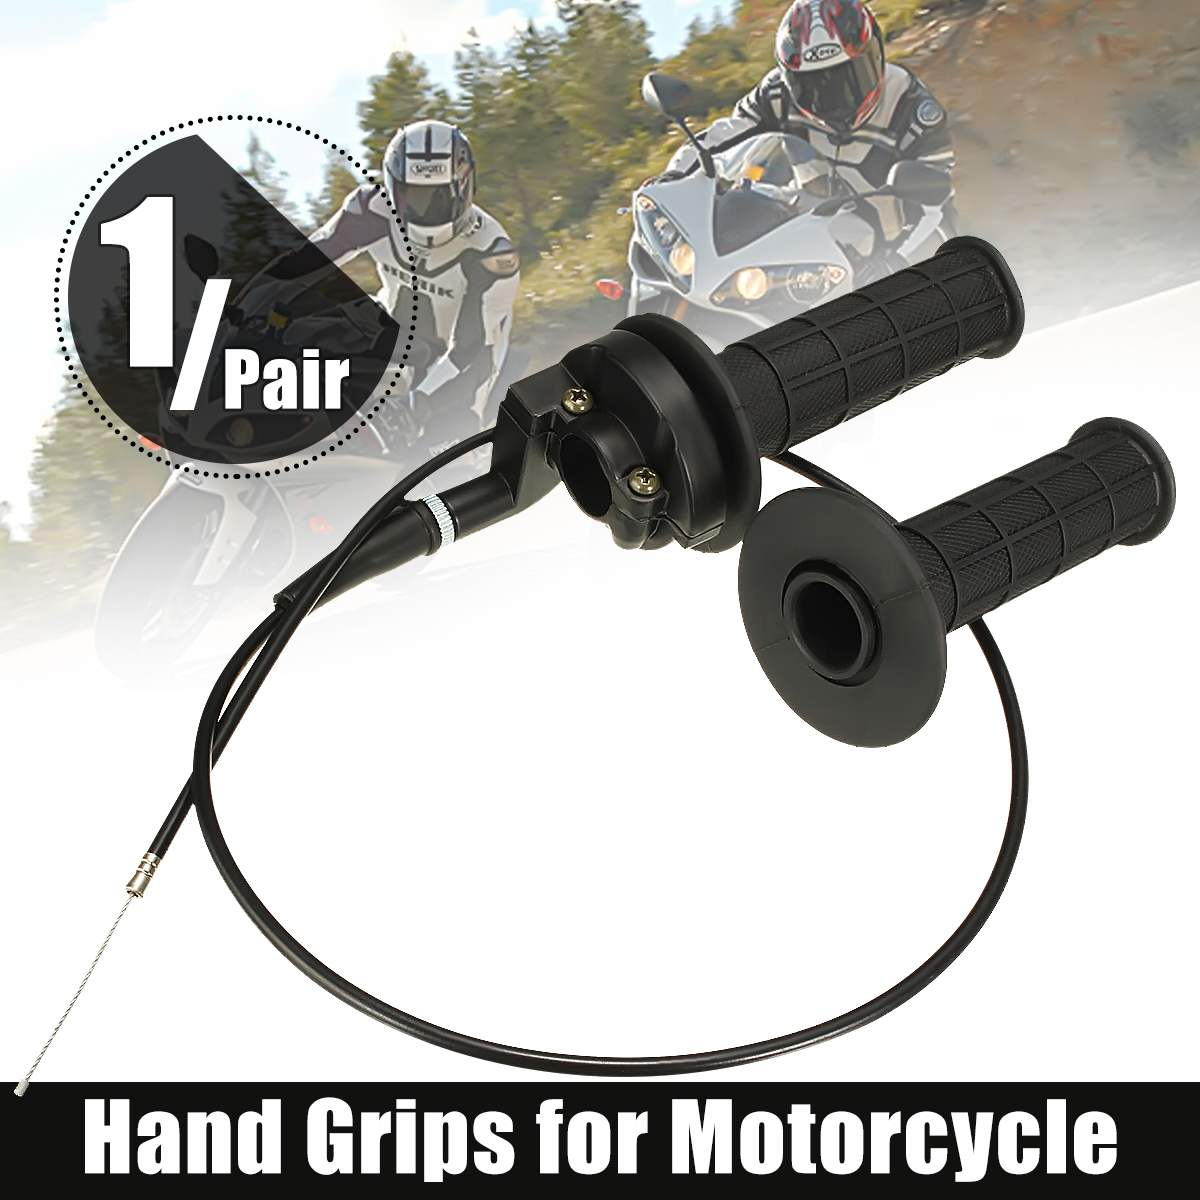 "1 par de empuñaduras universales de 7/8 ""22mm para Acelerador de motocicleta manillar con Cable de alambre para moto de cross Pit Bike ATV Scooter"